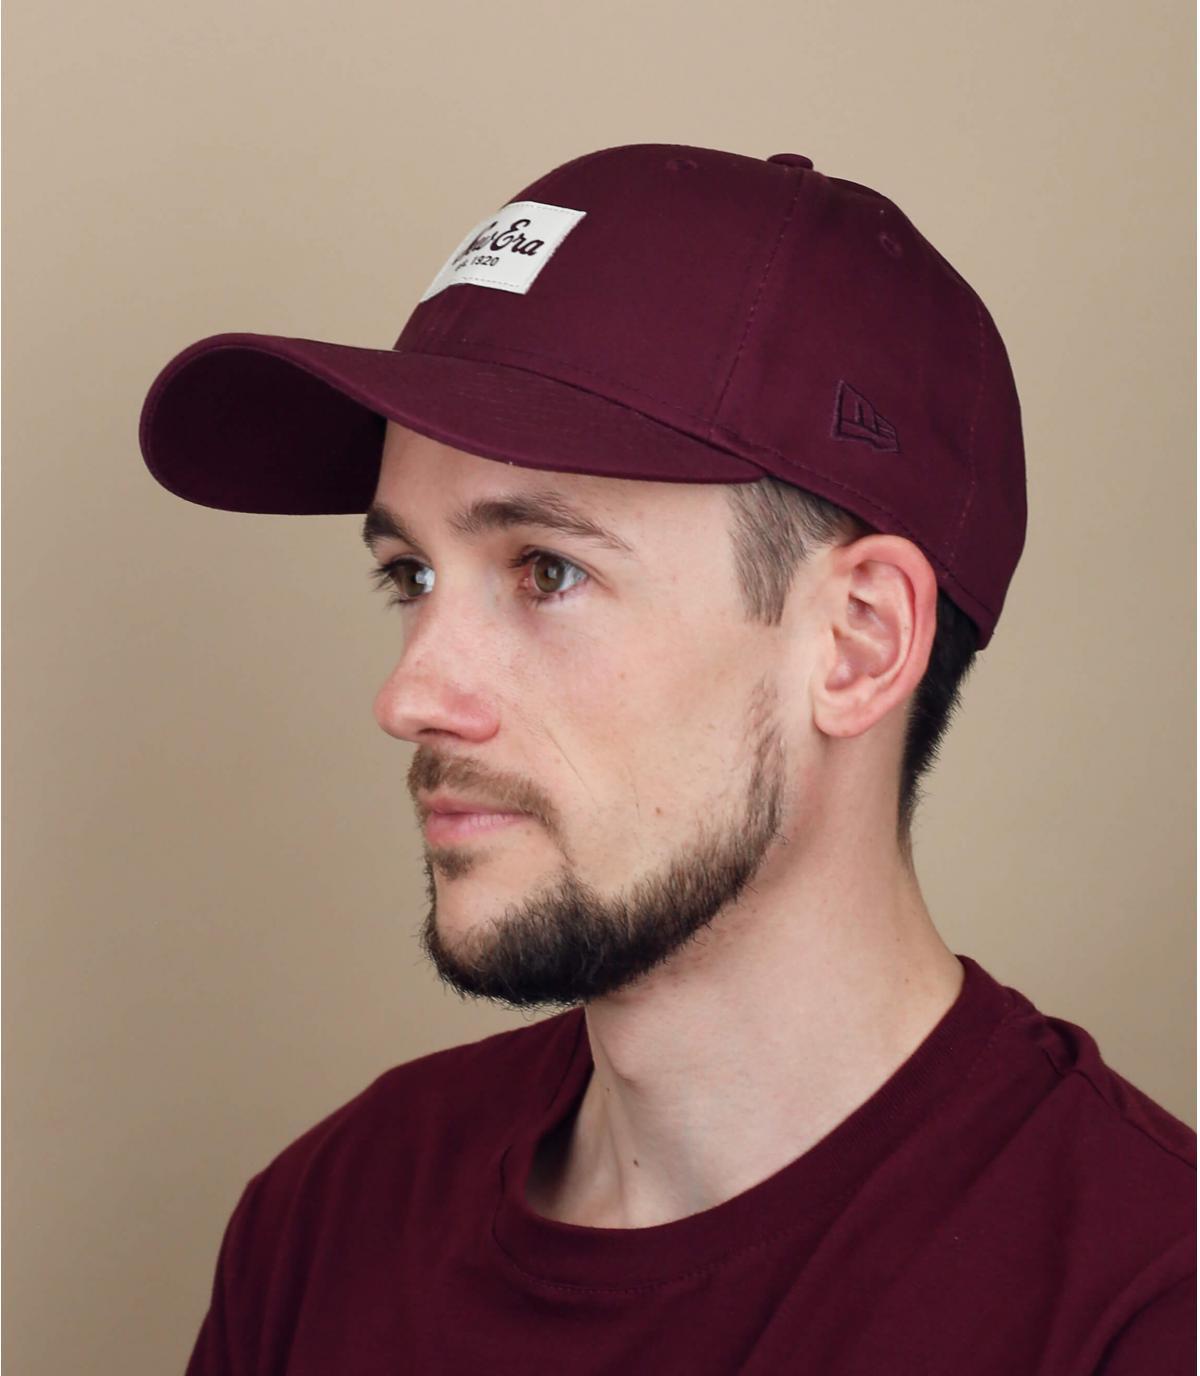 bordeauxrode New Era cap